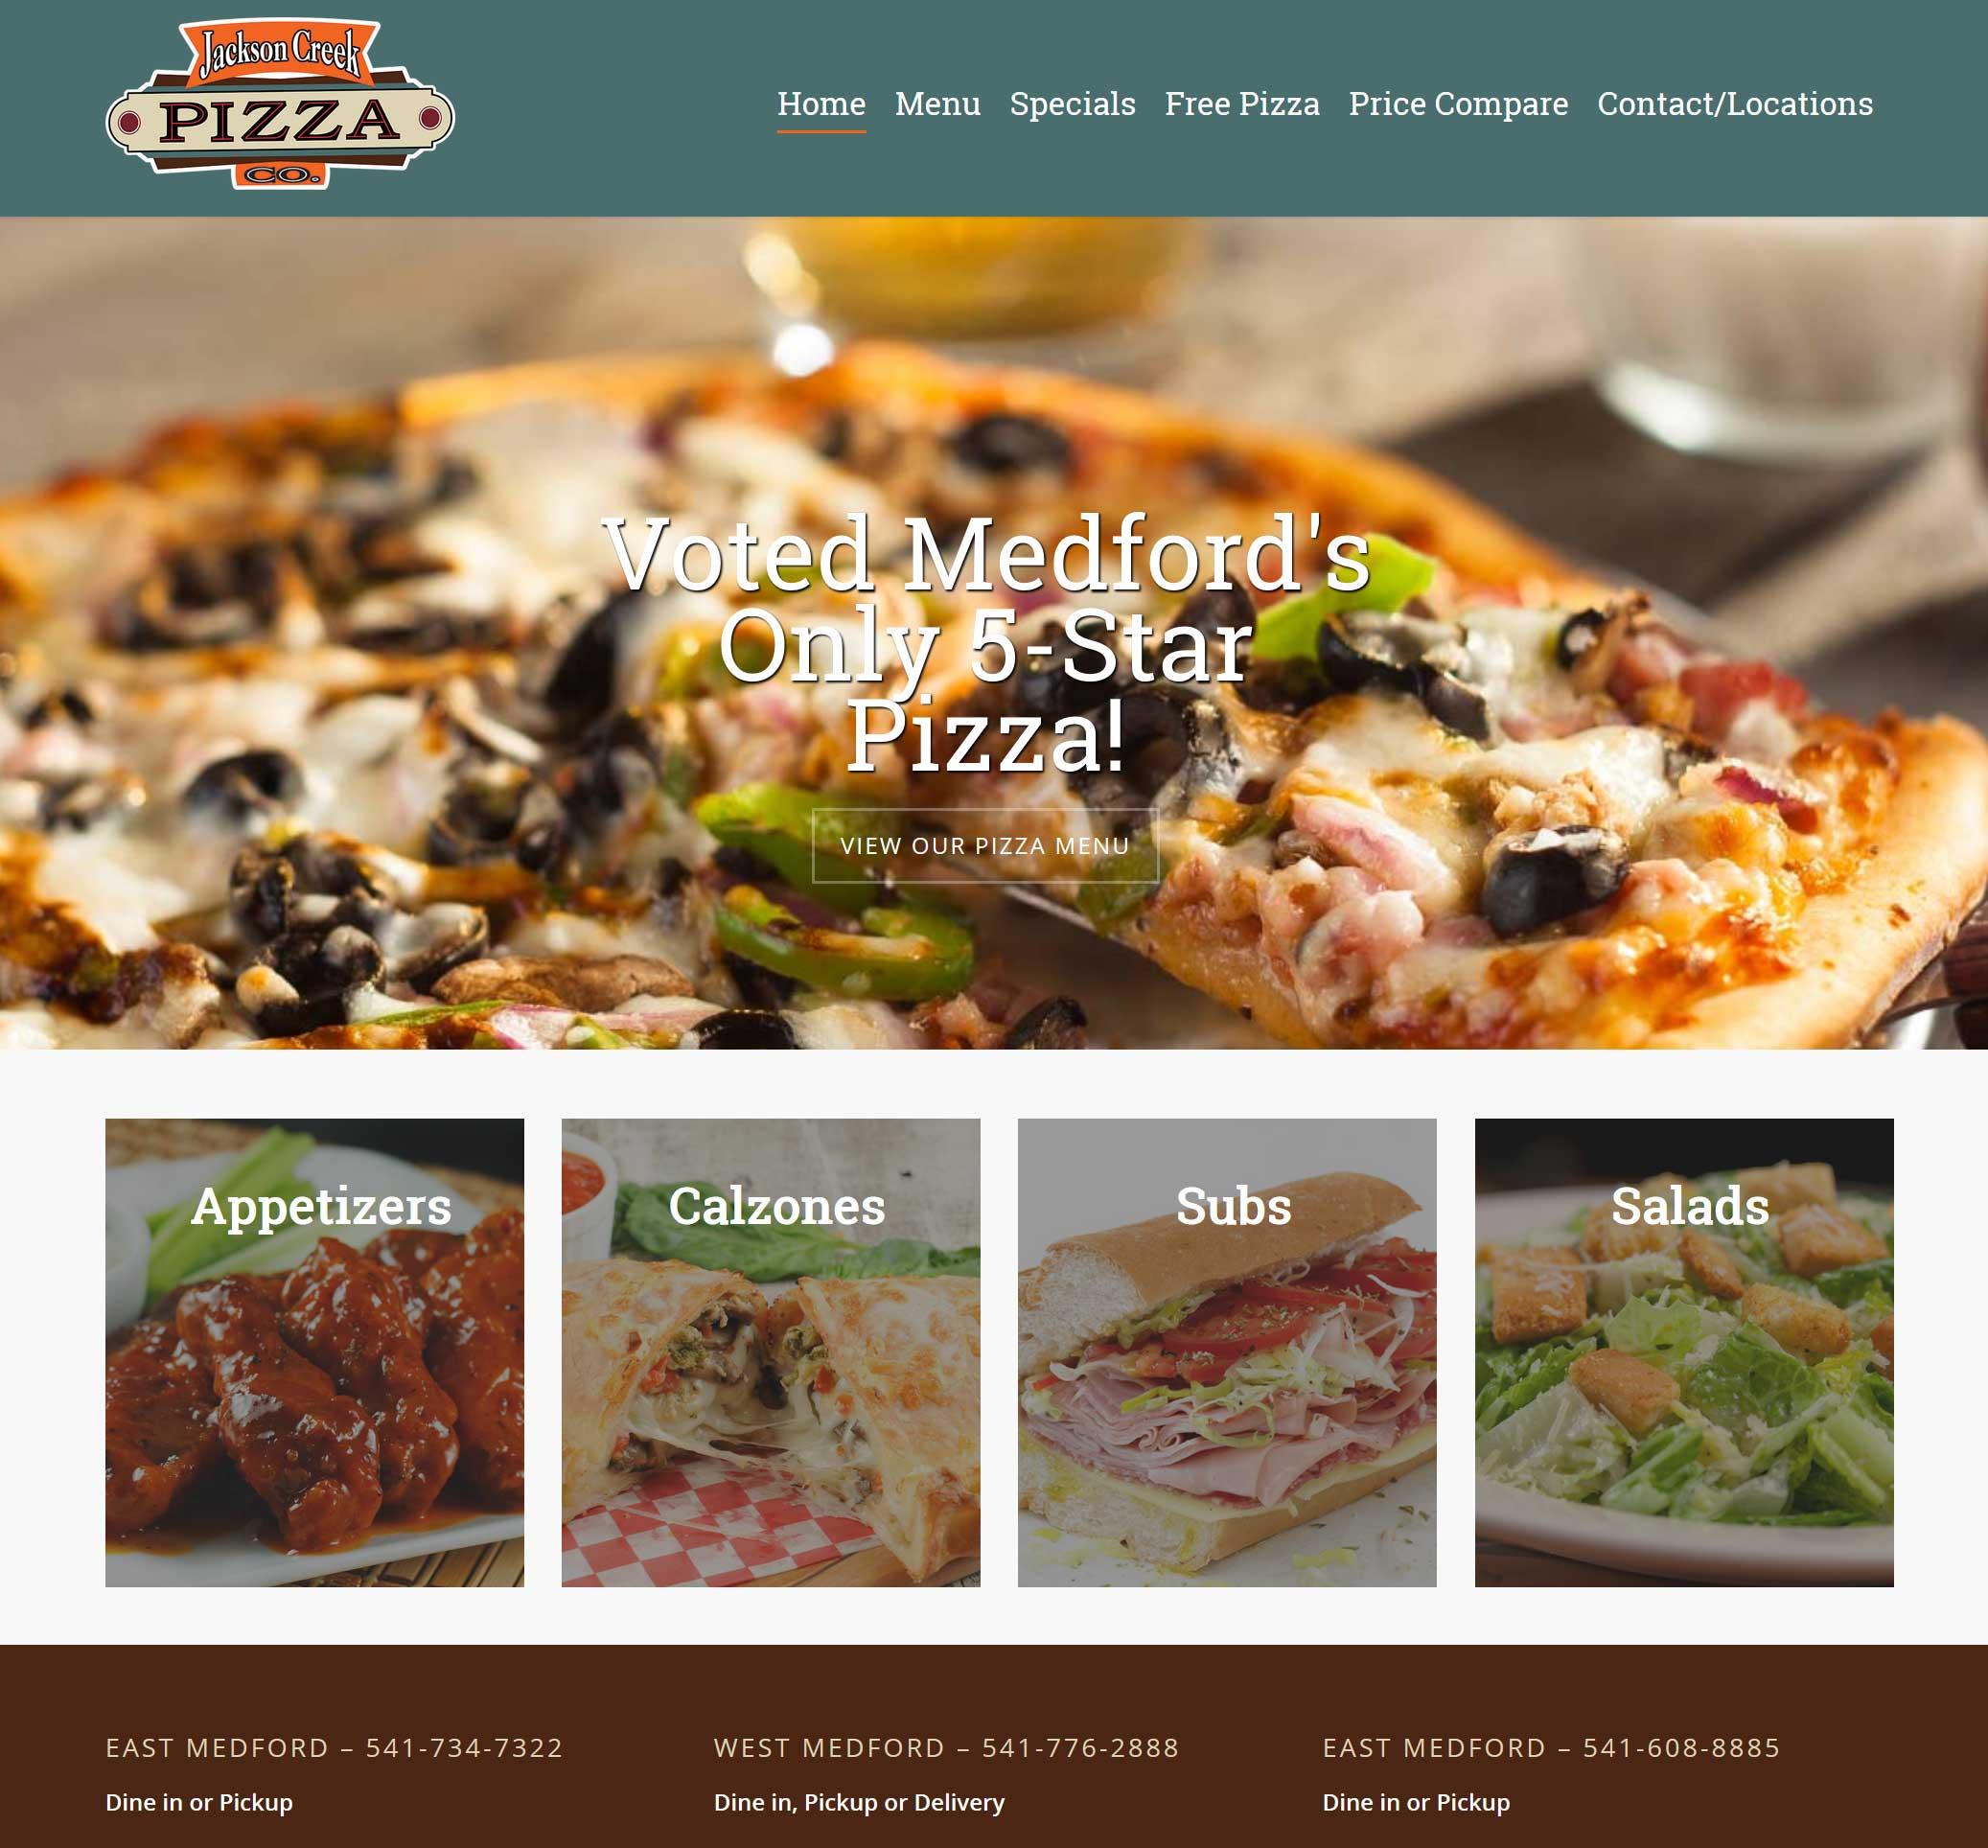 Web Design Portfolio • Creative Marketing & Design